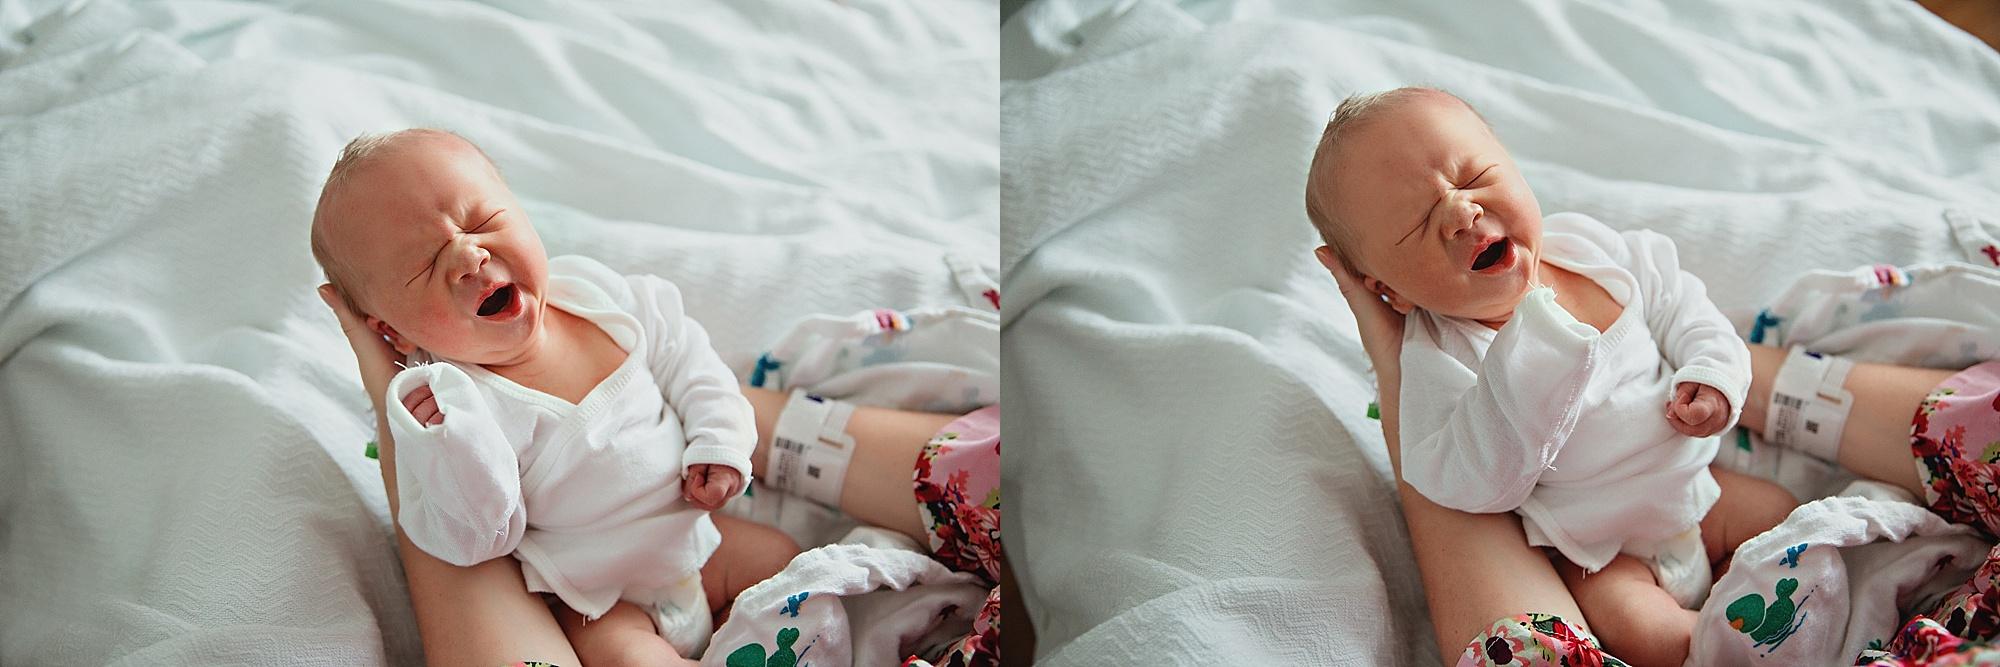 lauren-grayson-photography-akron-ohio-photographer-family-newborn-fresh-48-baby-hospital-photo-shoot-cleveland-clinic-akron-general-carter_0317.jpg